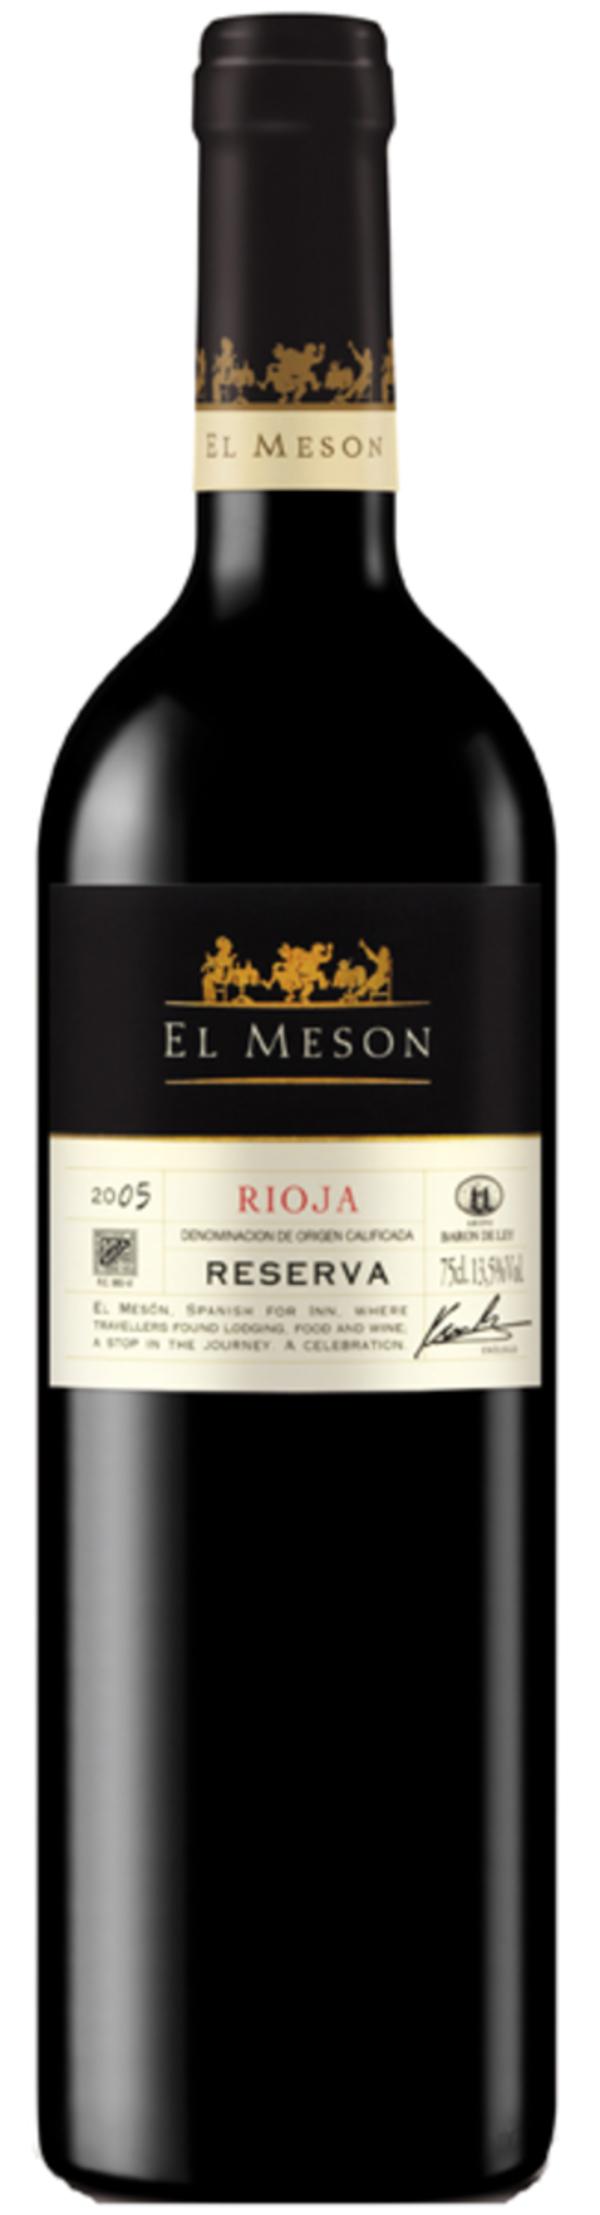 El Meson Rioja Reserva Tempranillo Rotwein 2015 0,75 ltr